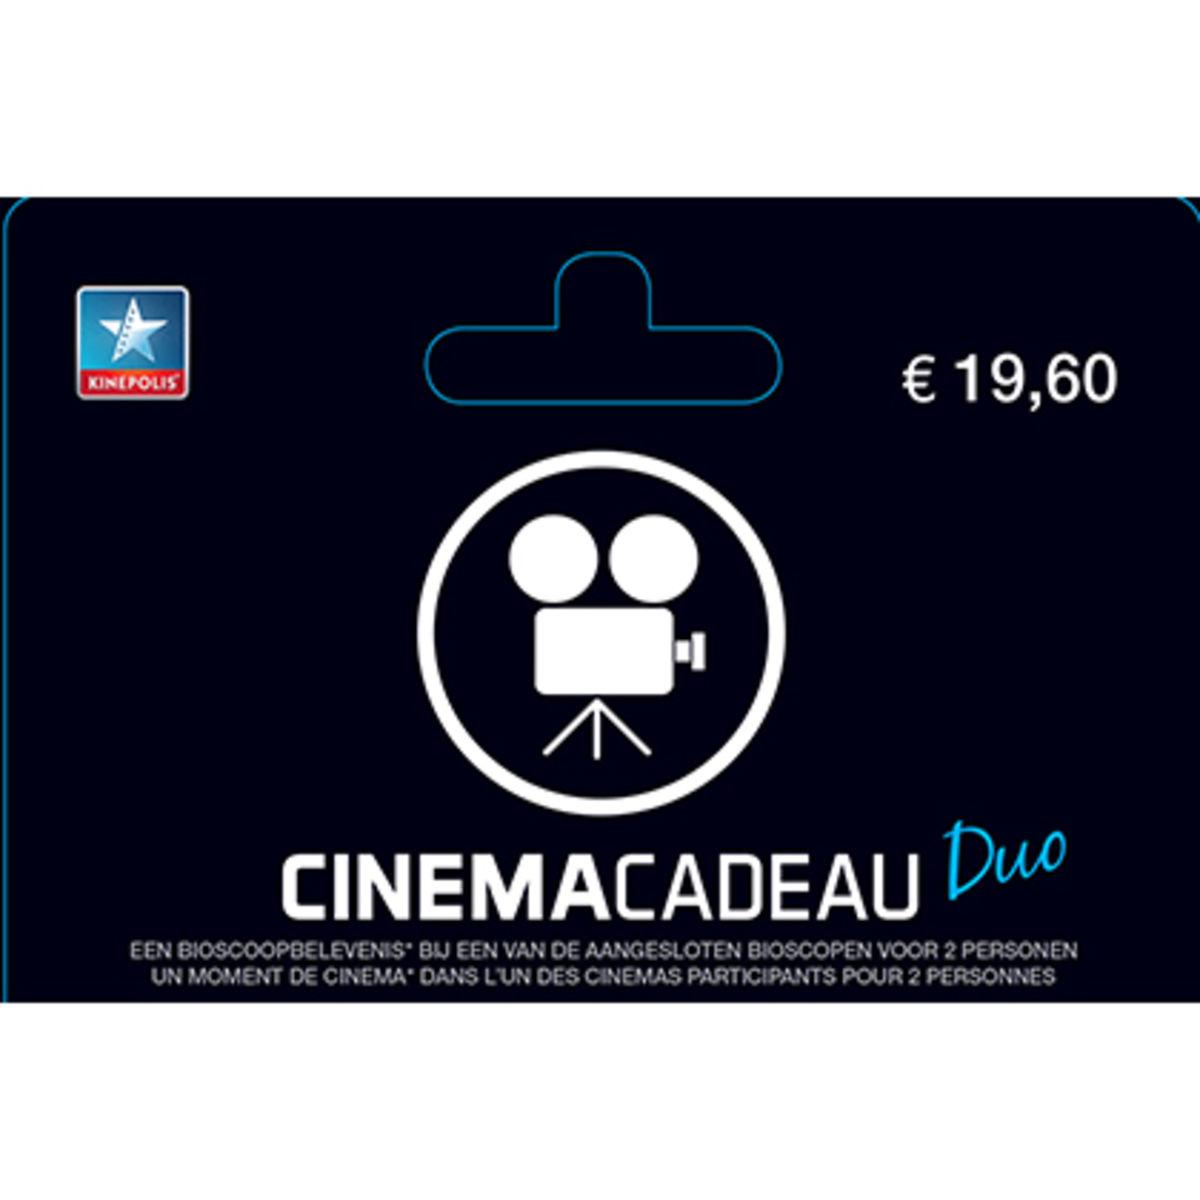 Cinema Cadeau Duo kaart